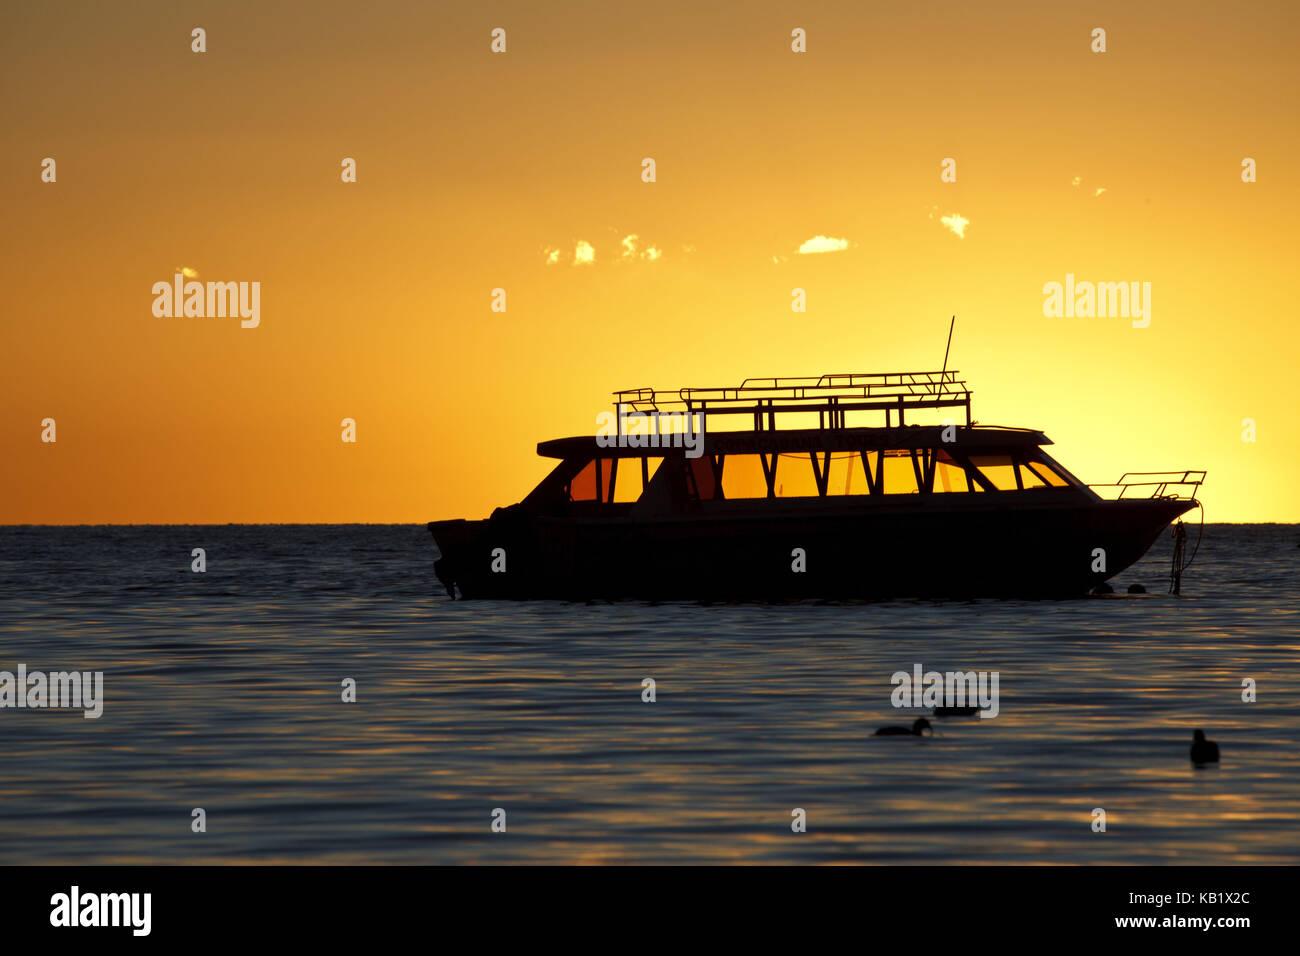 Bolivia, Titicacasee, Copacabana, sundown, Boat, - Stock Image